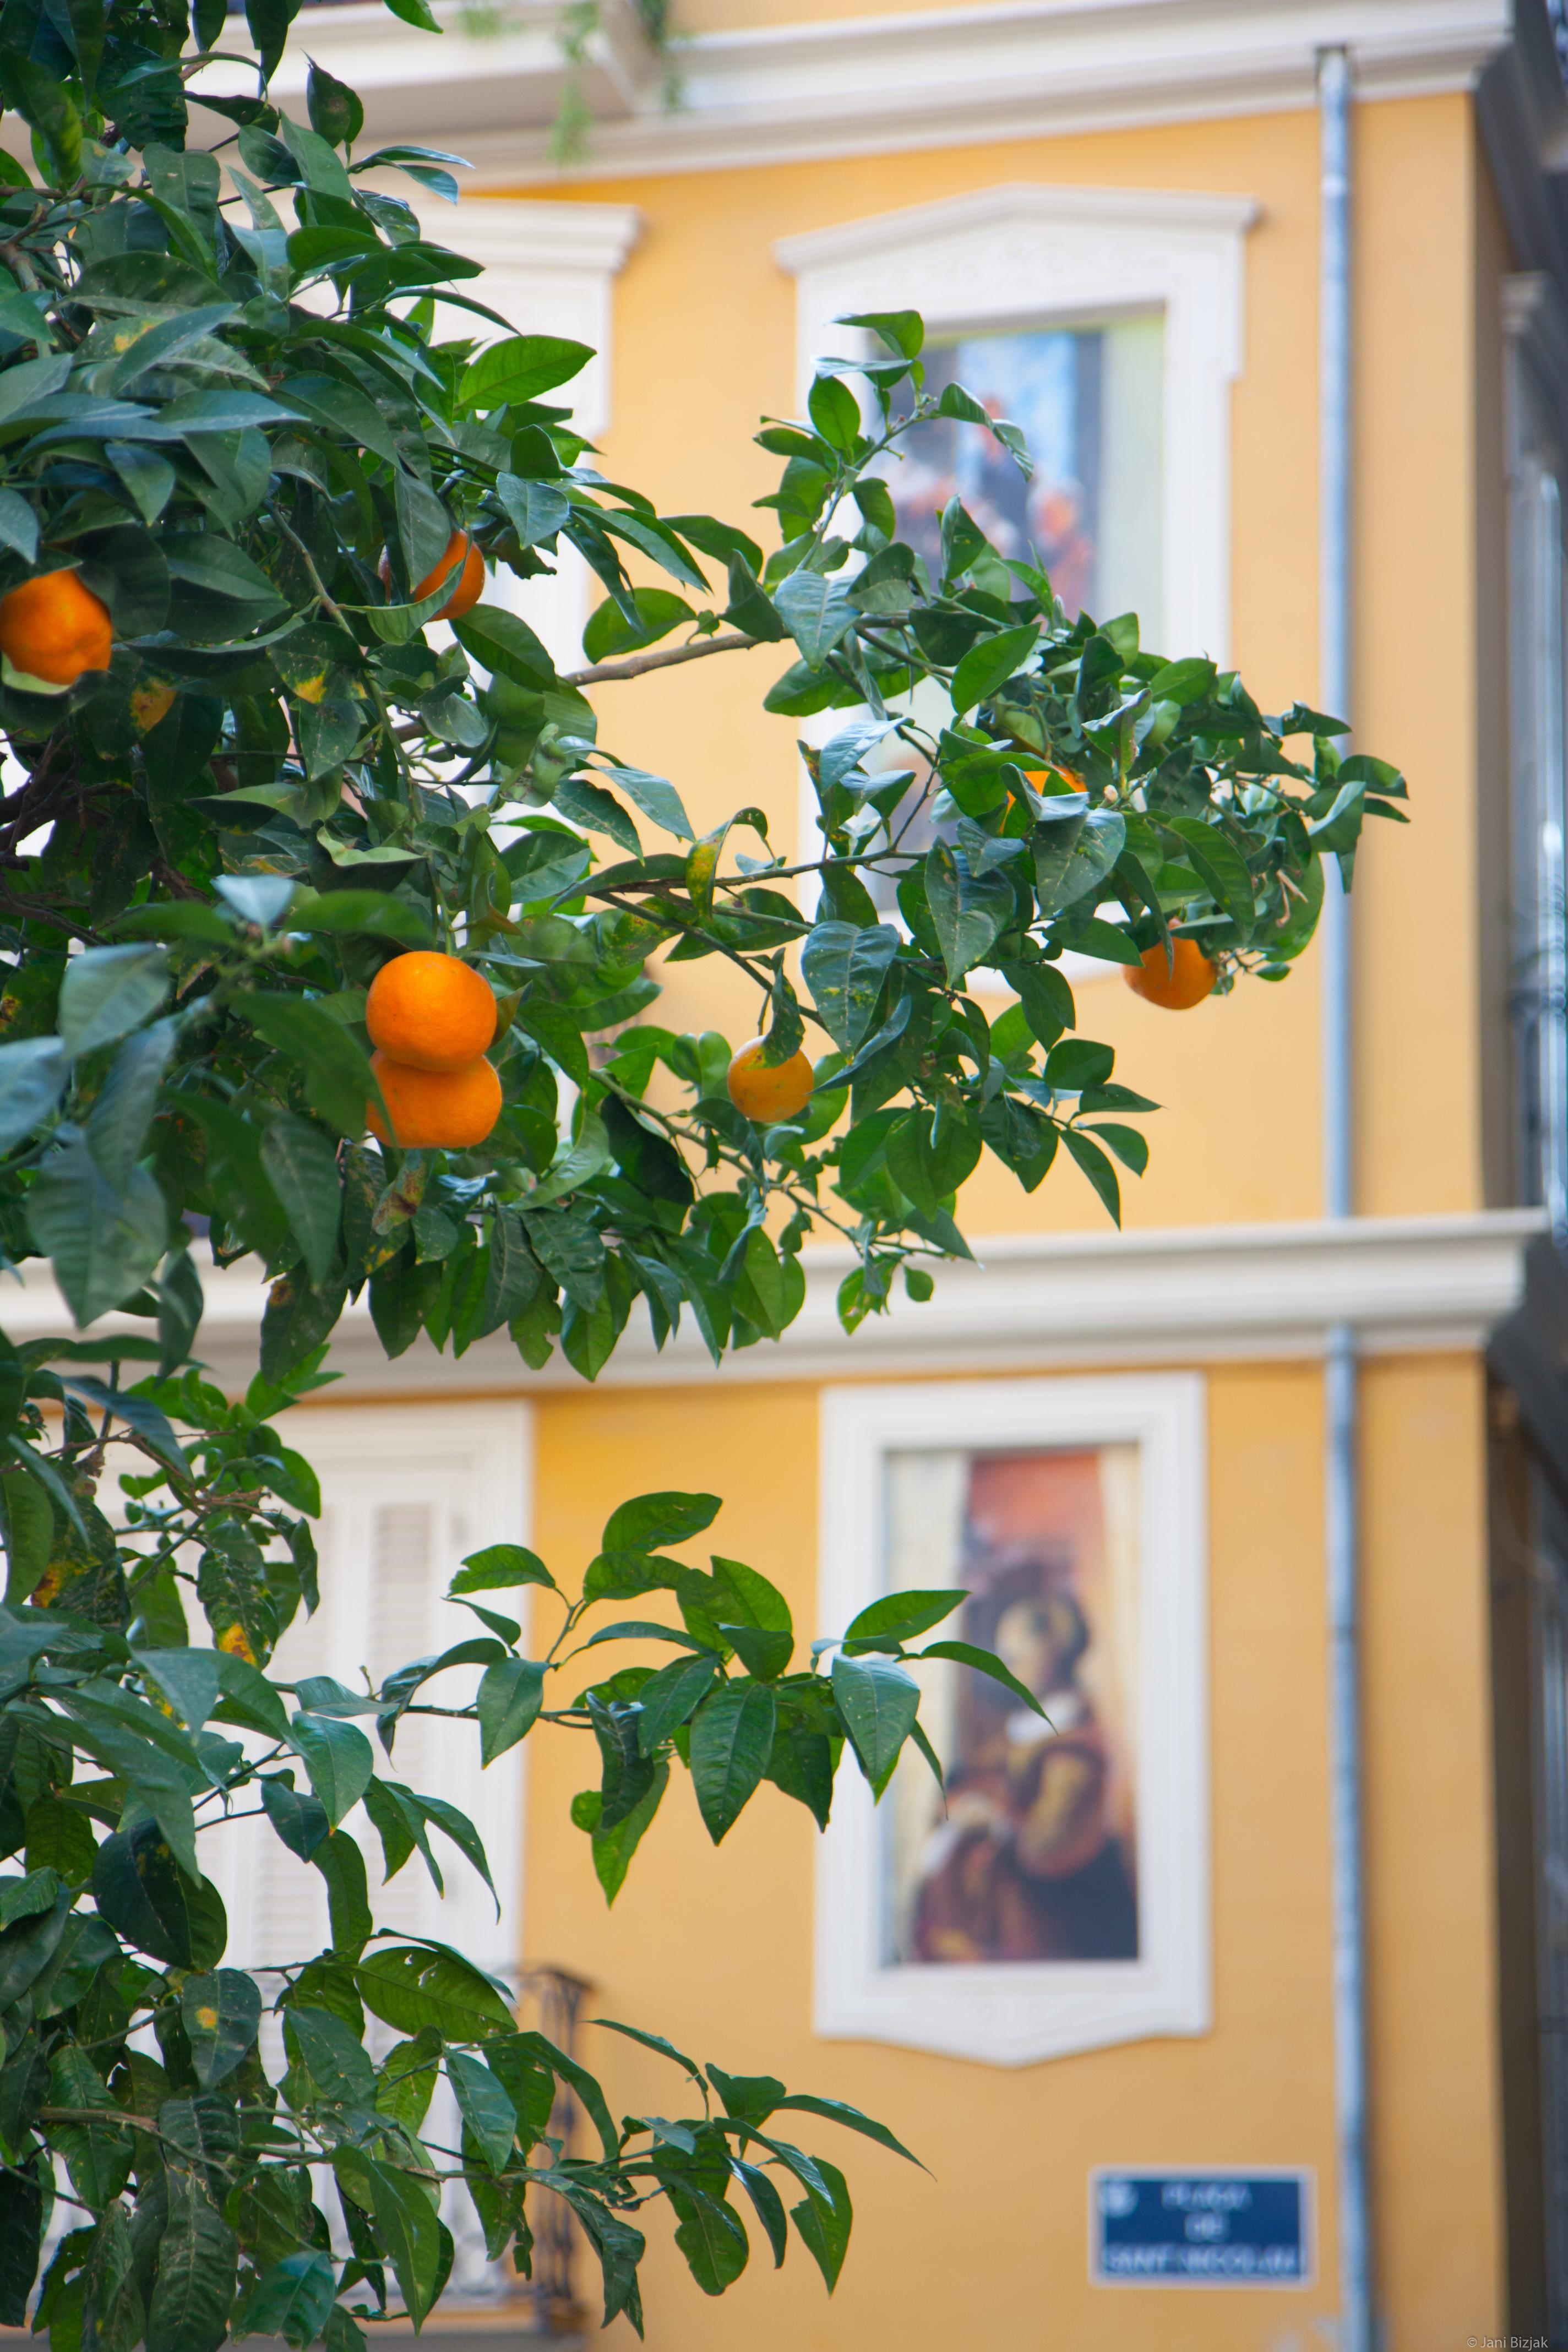 Mandarins in the street